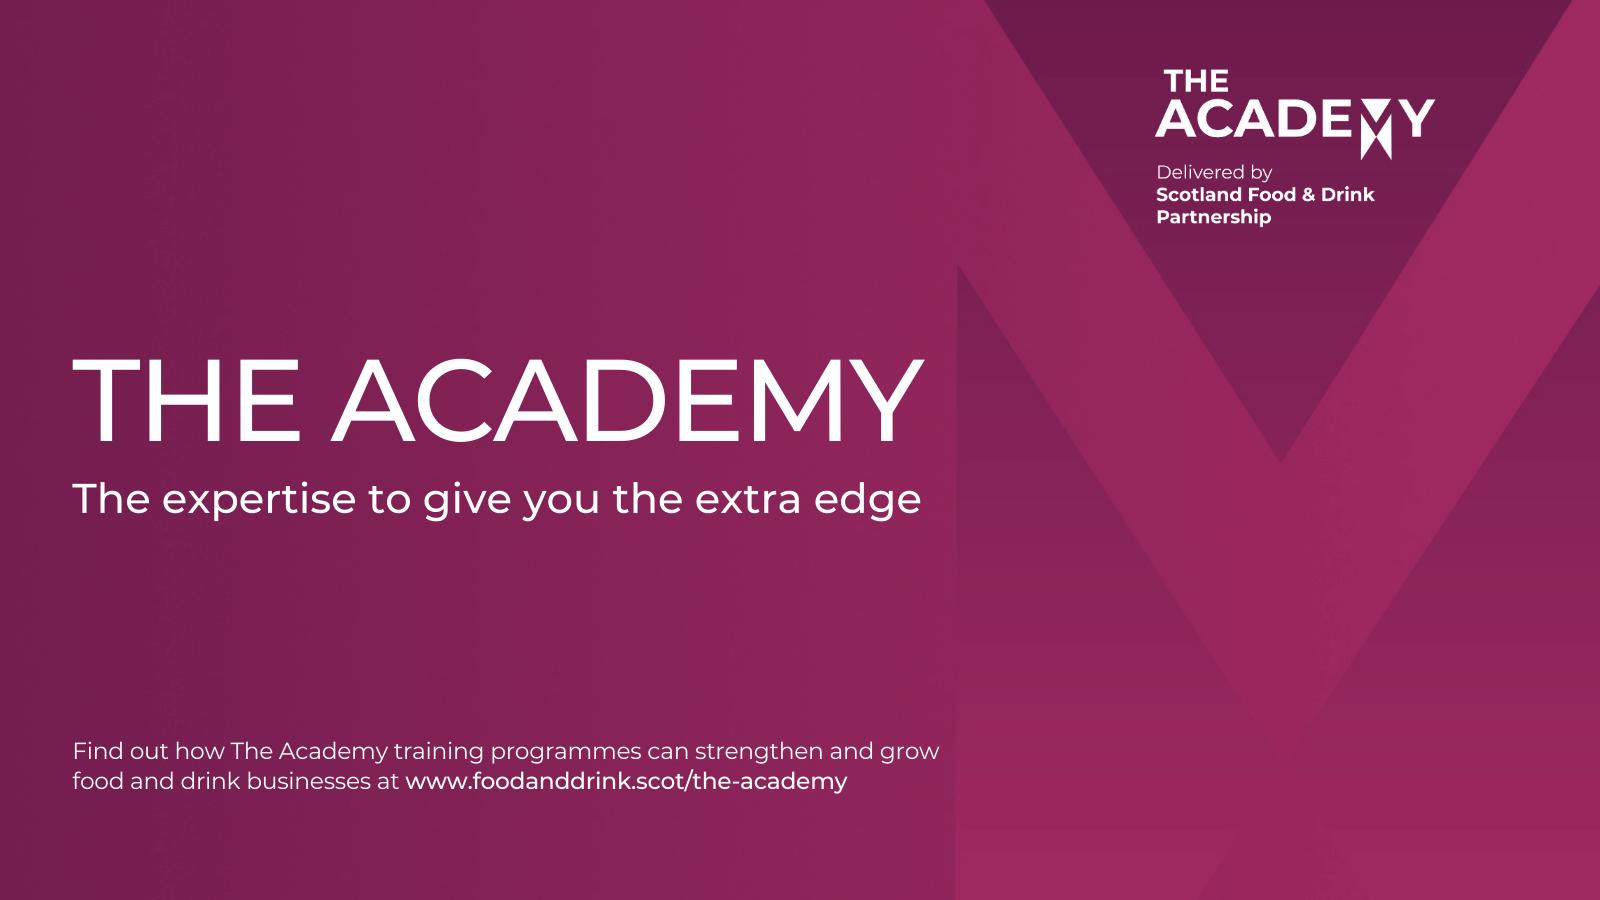 Scotland Food & Drink Partnership- The Academy